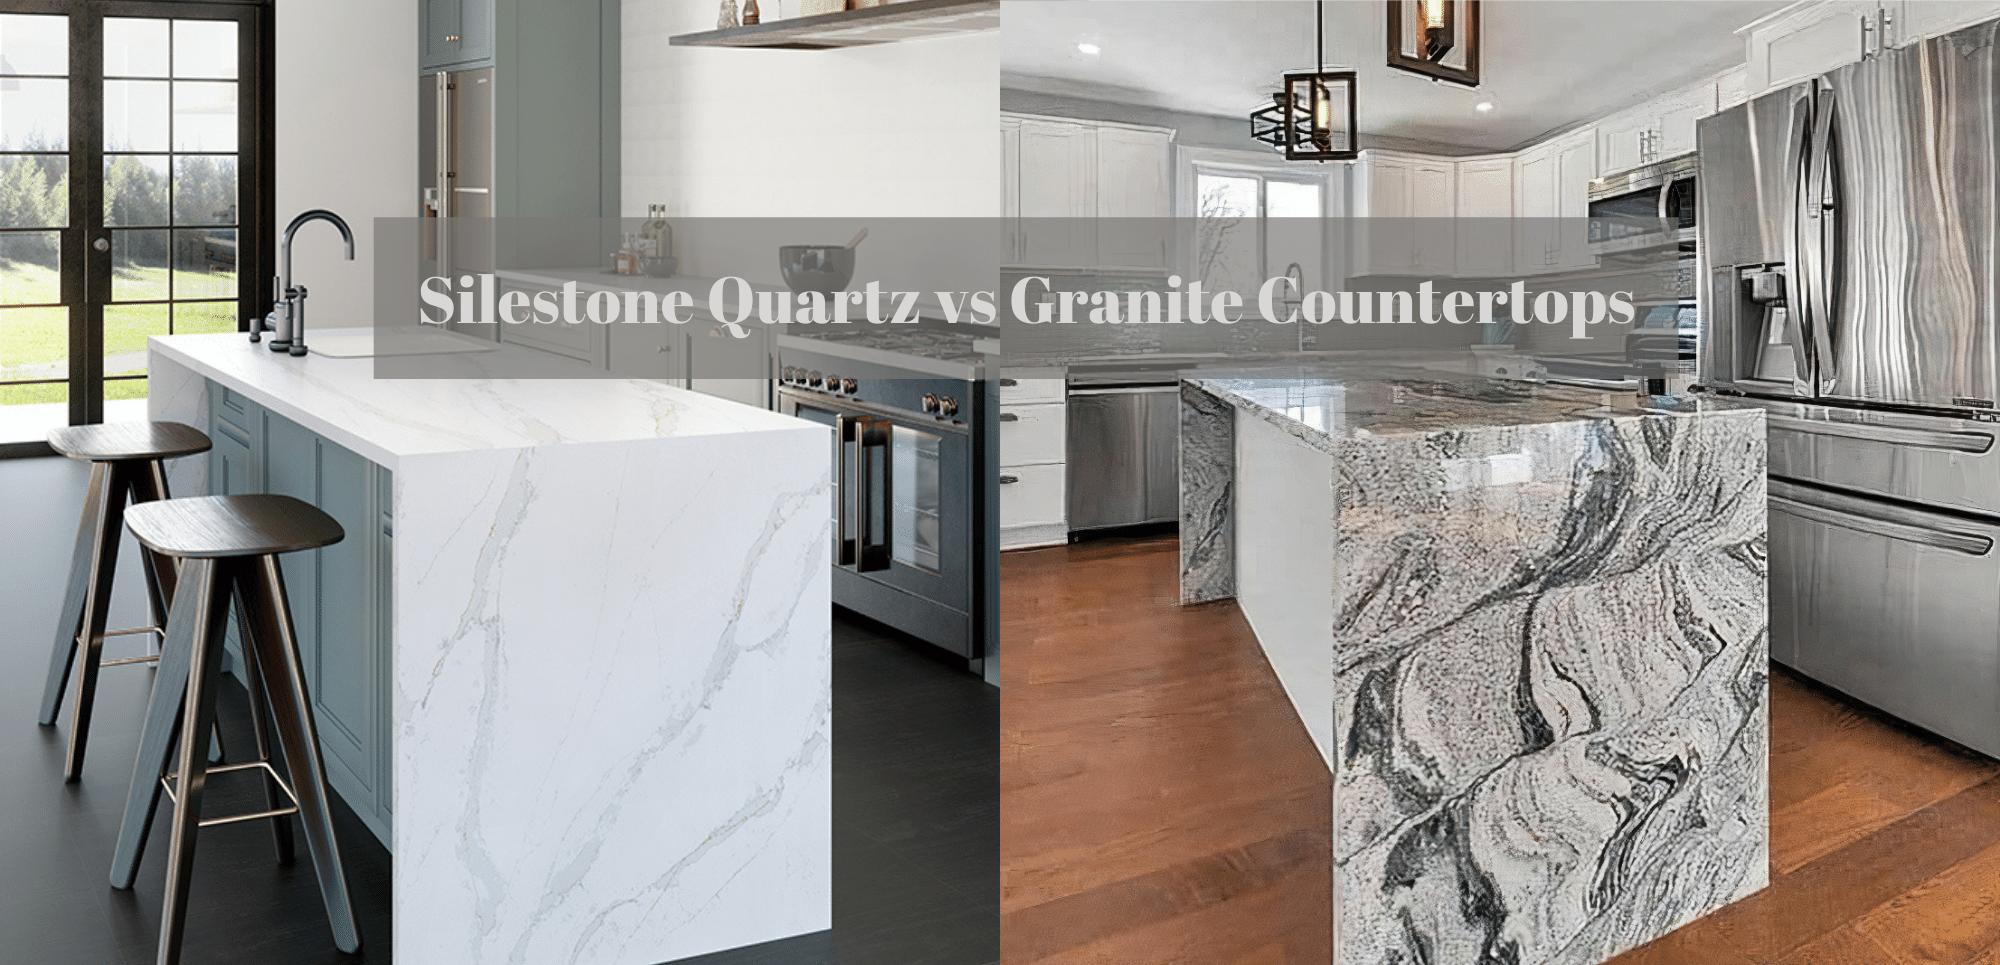 Silestone Quartz Countertops vs Granite Countertops Whats the Difference silestone quartz vs granite silestone vs granite